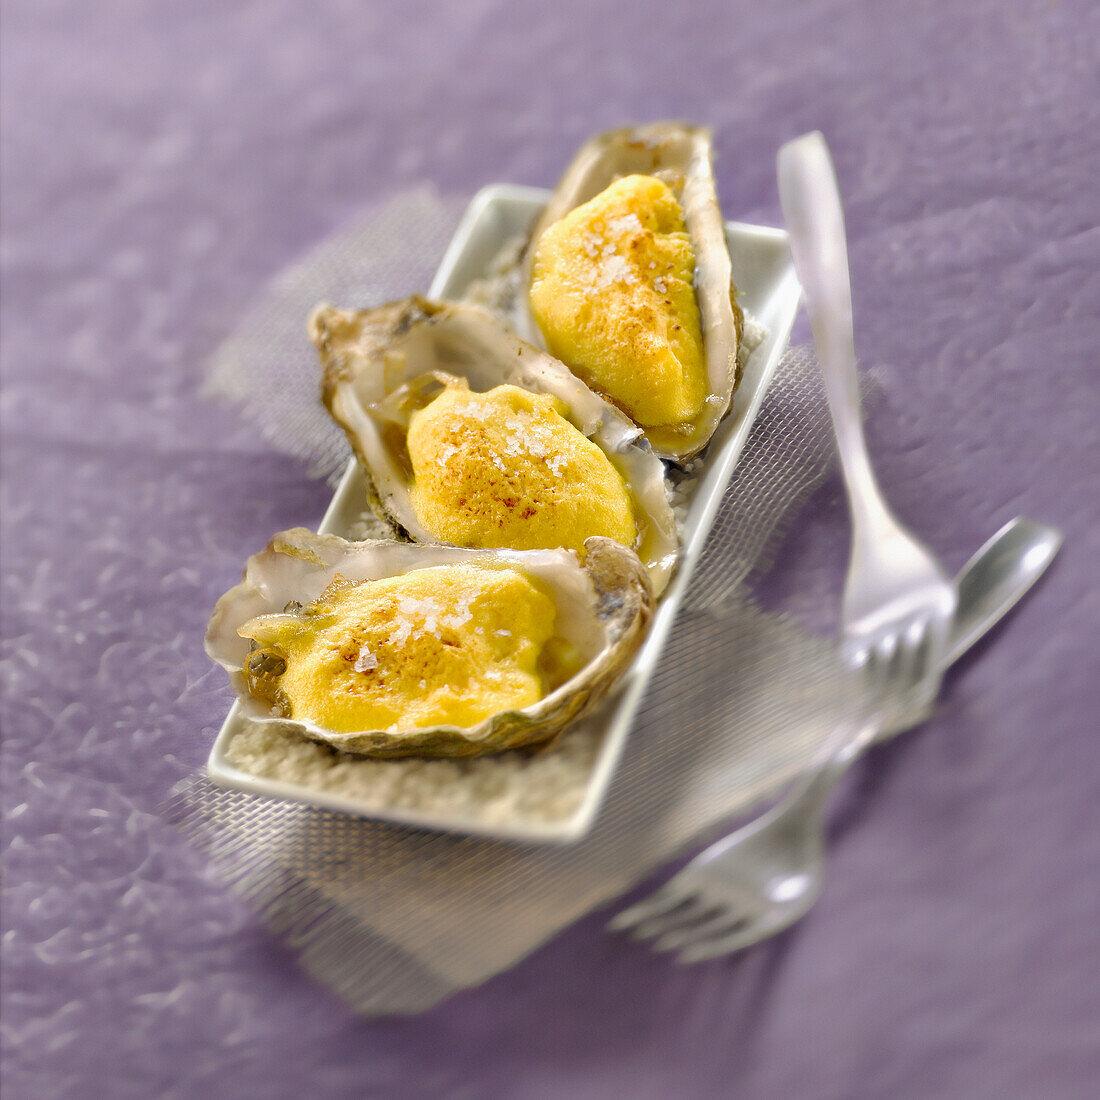 Oyster and Champagne Crème brûlée